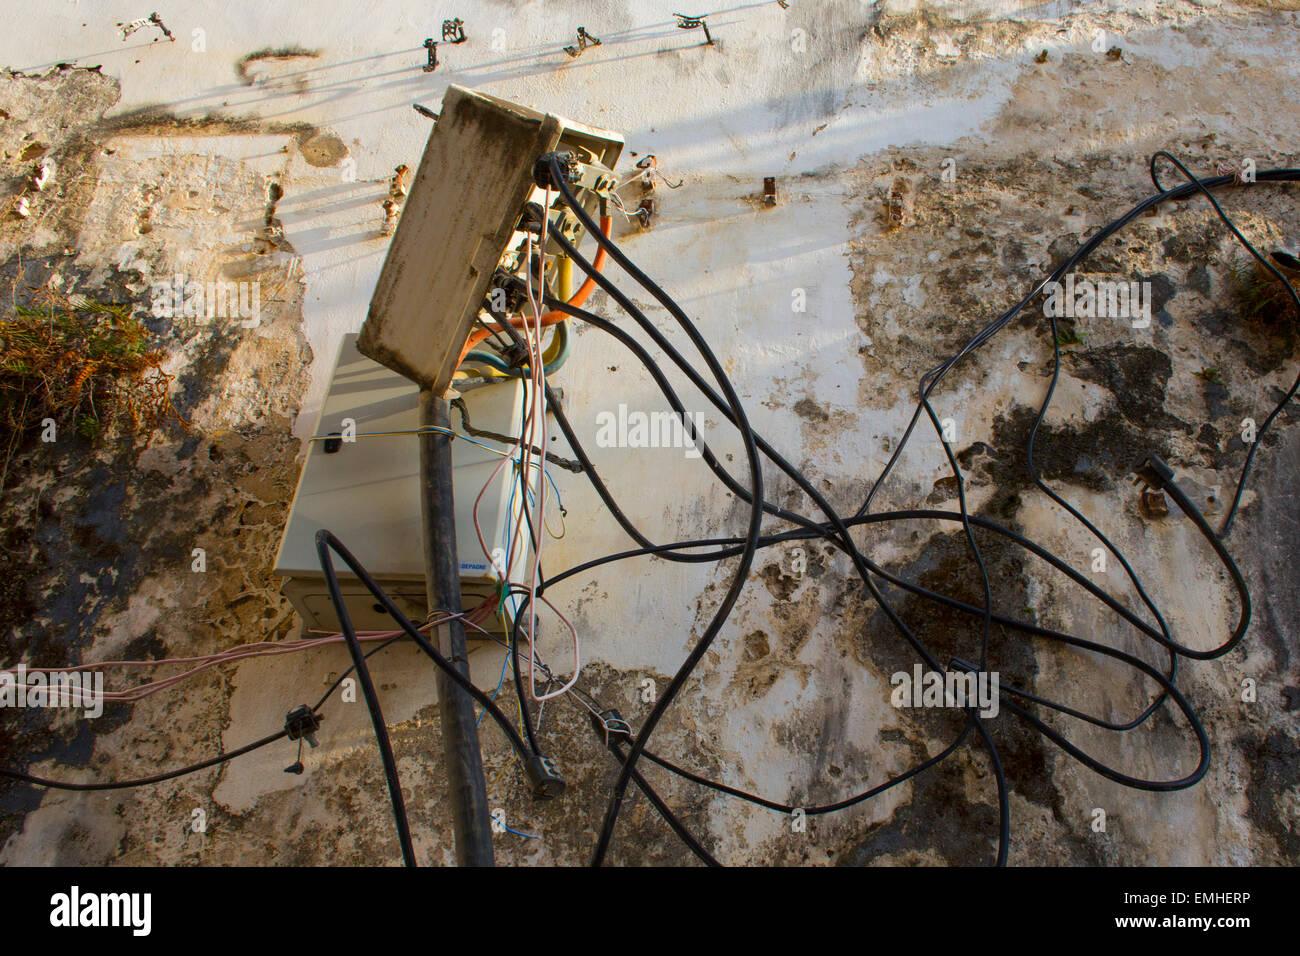 hight resolution of poor electrical wiring in zanzibar stock image